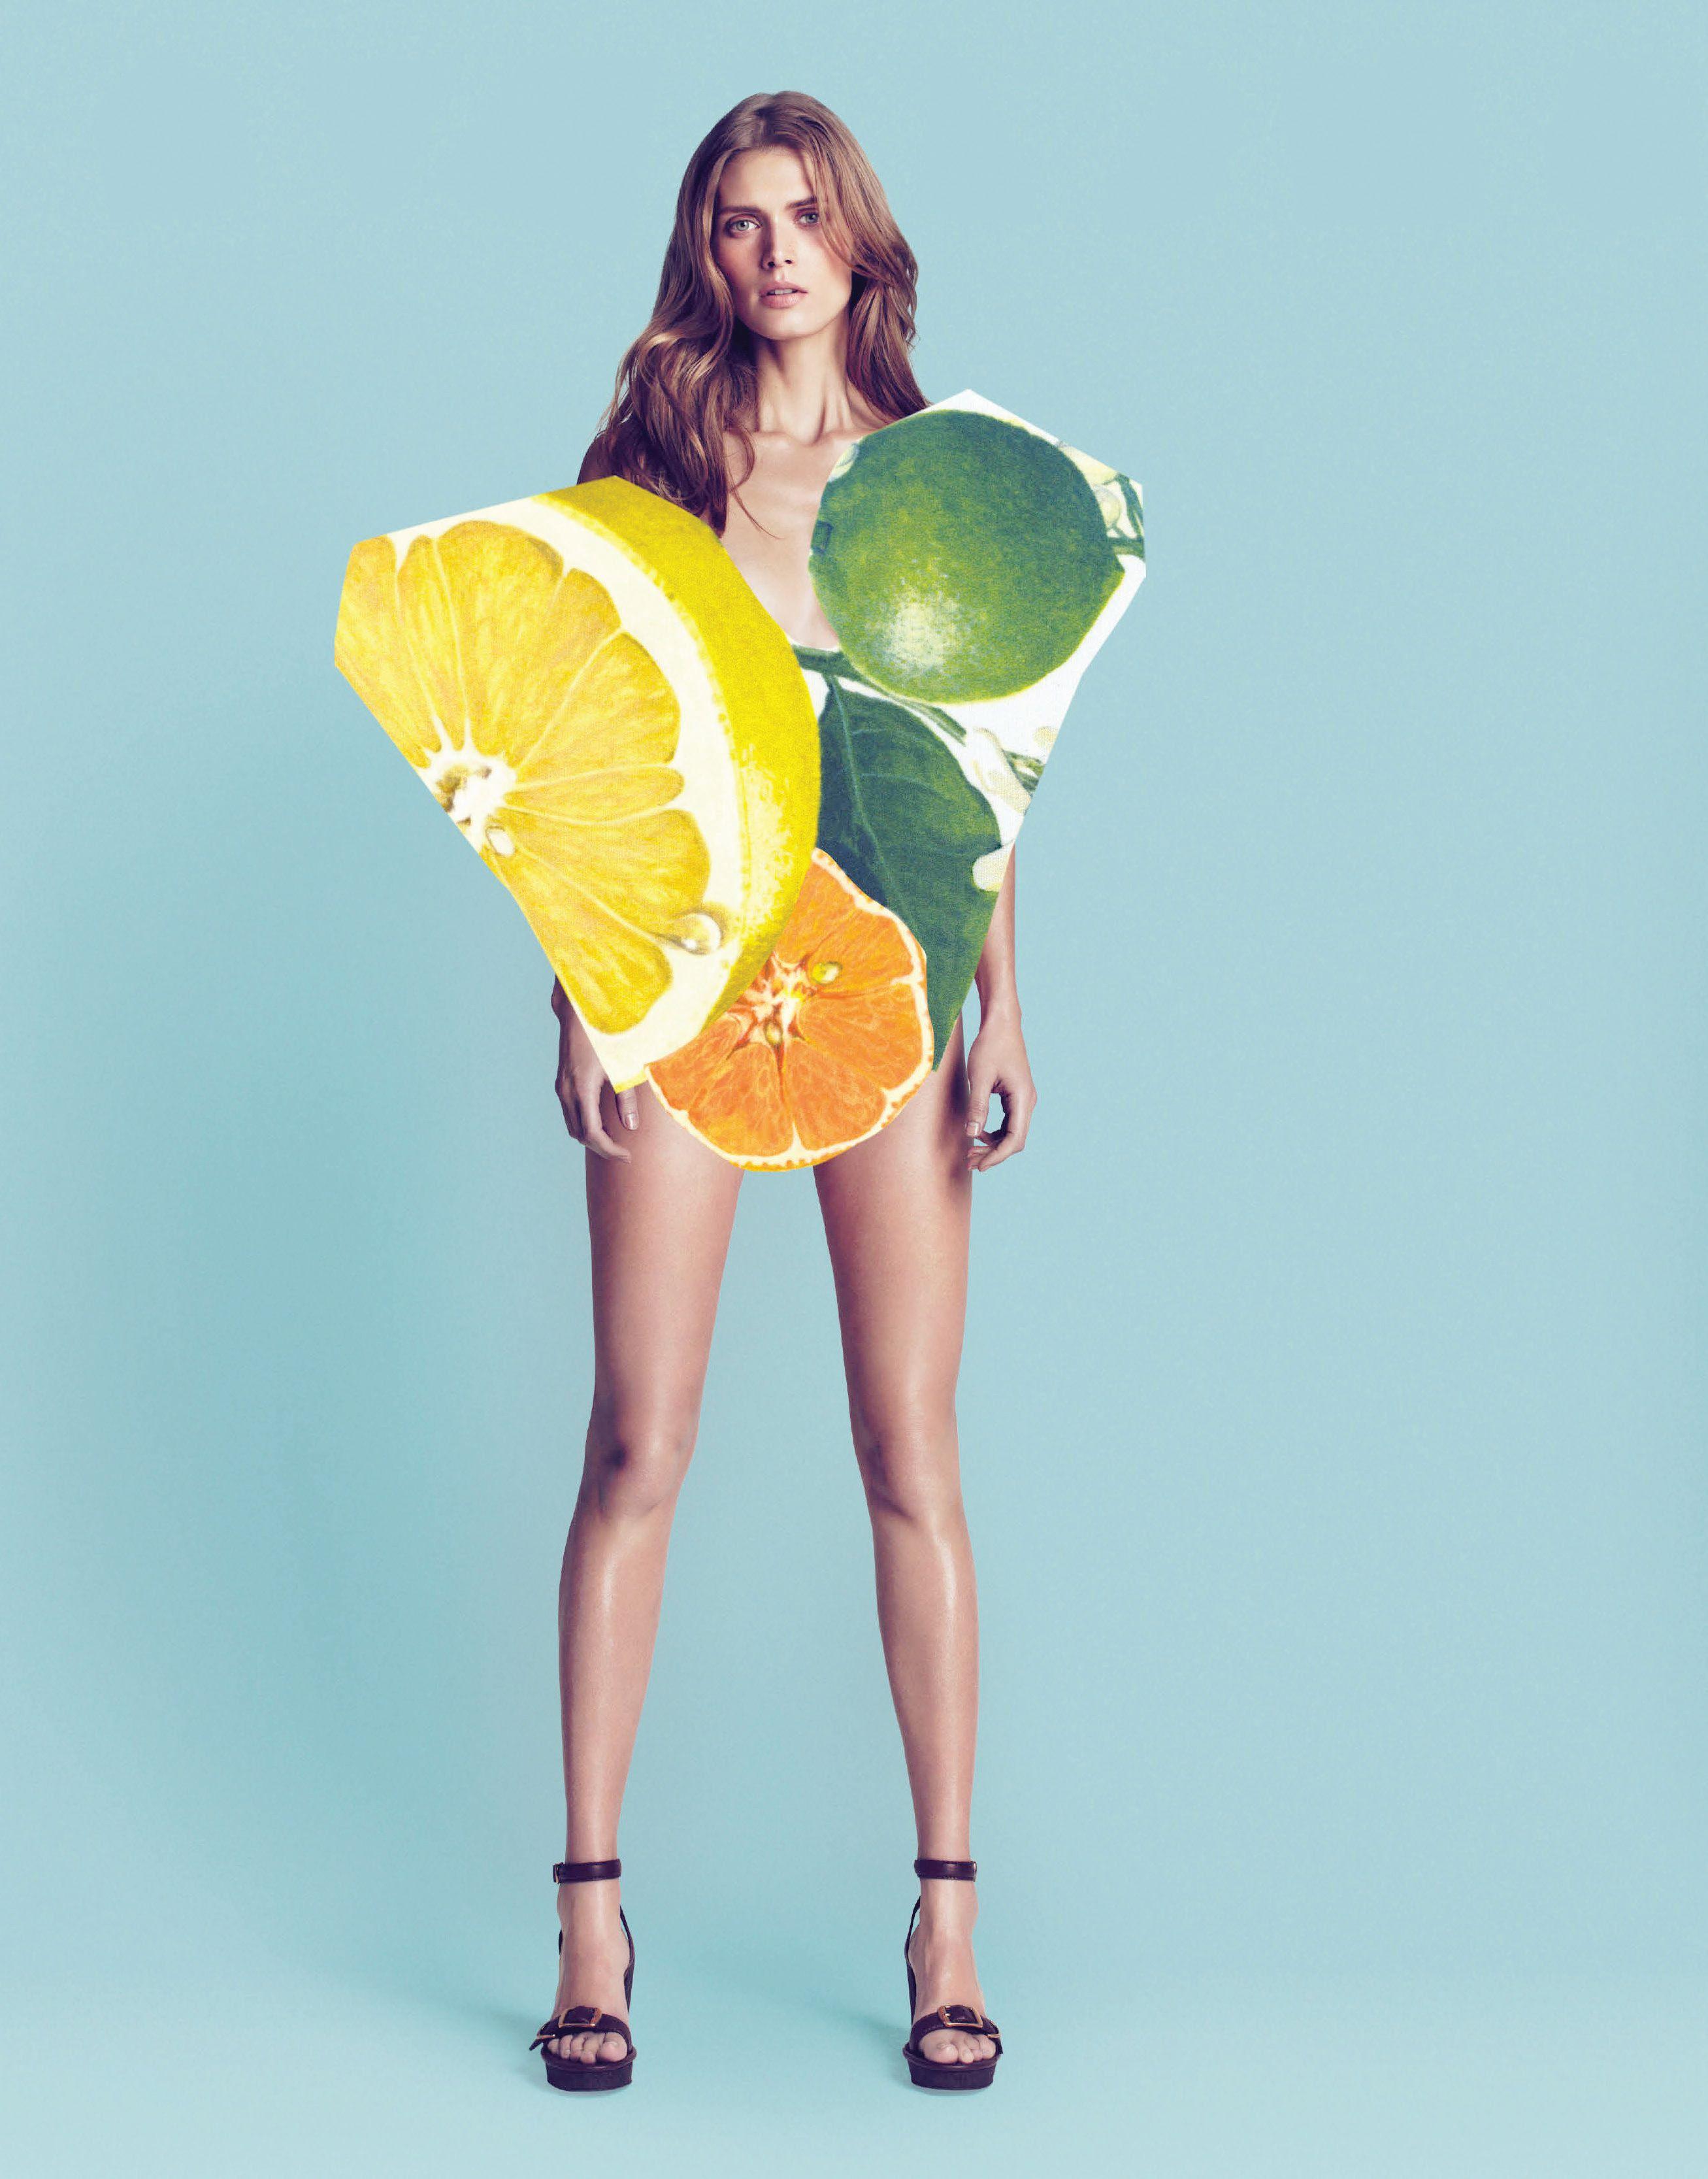 Sočni citrusi